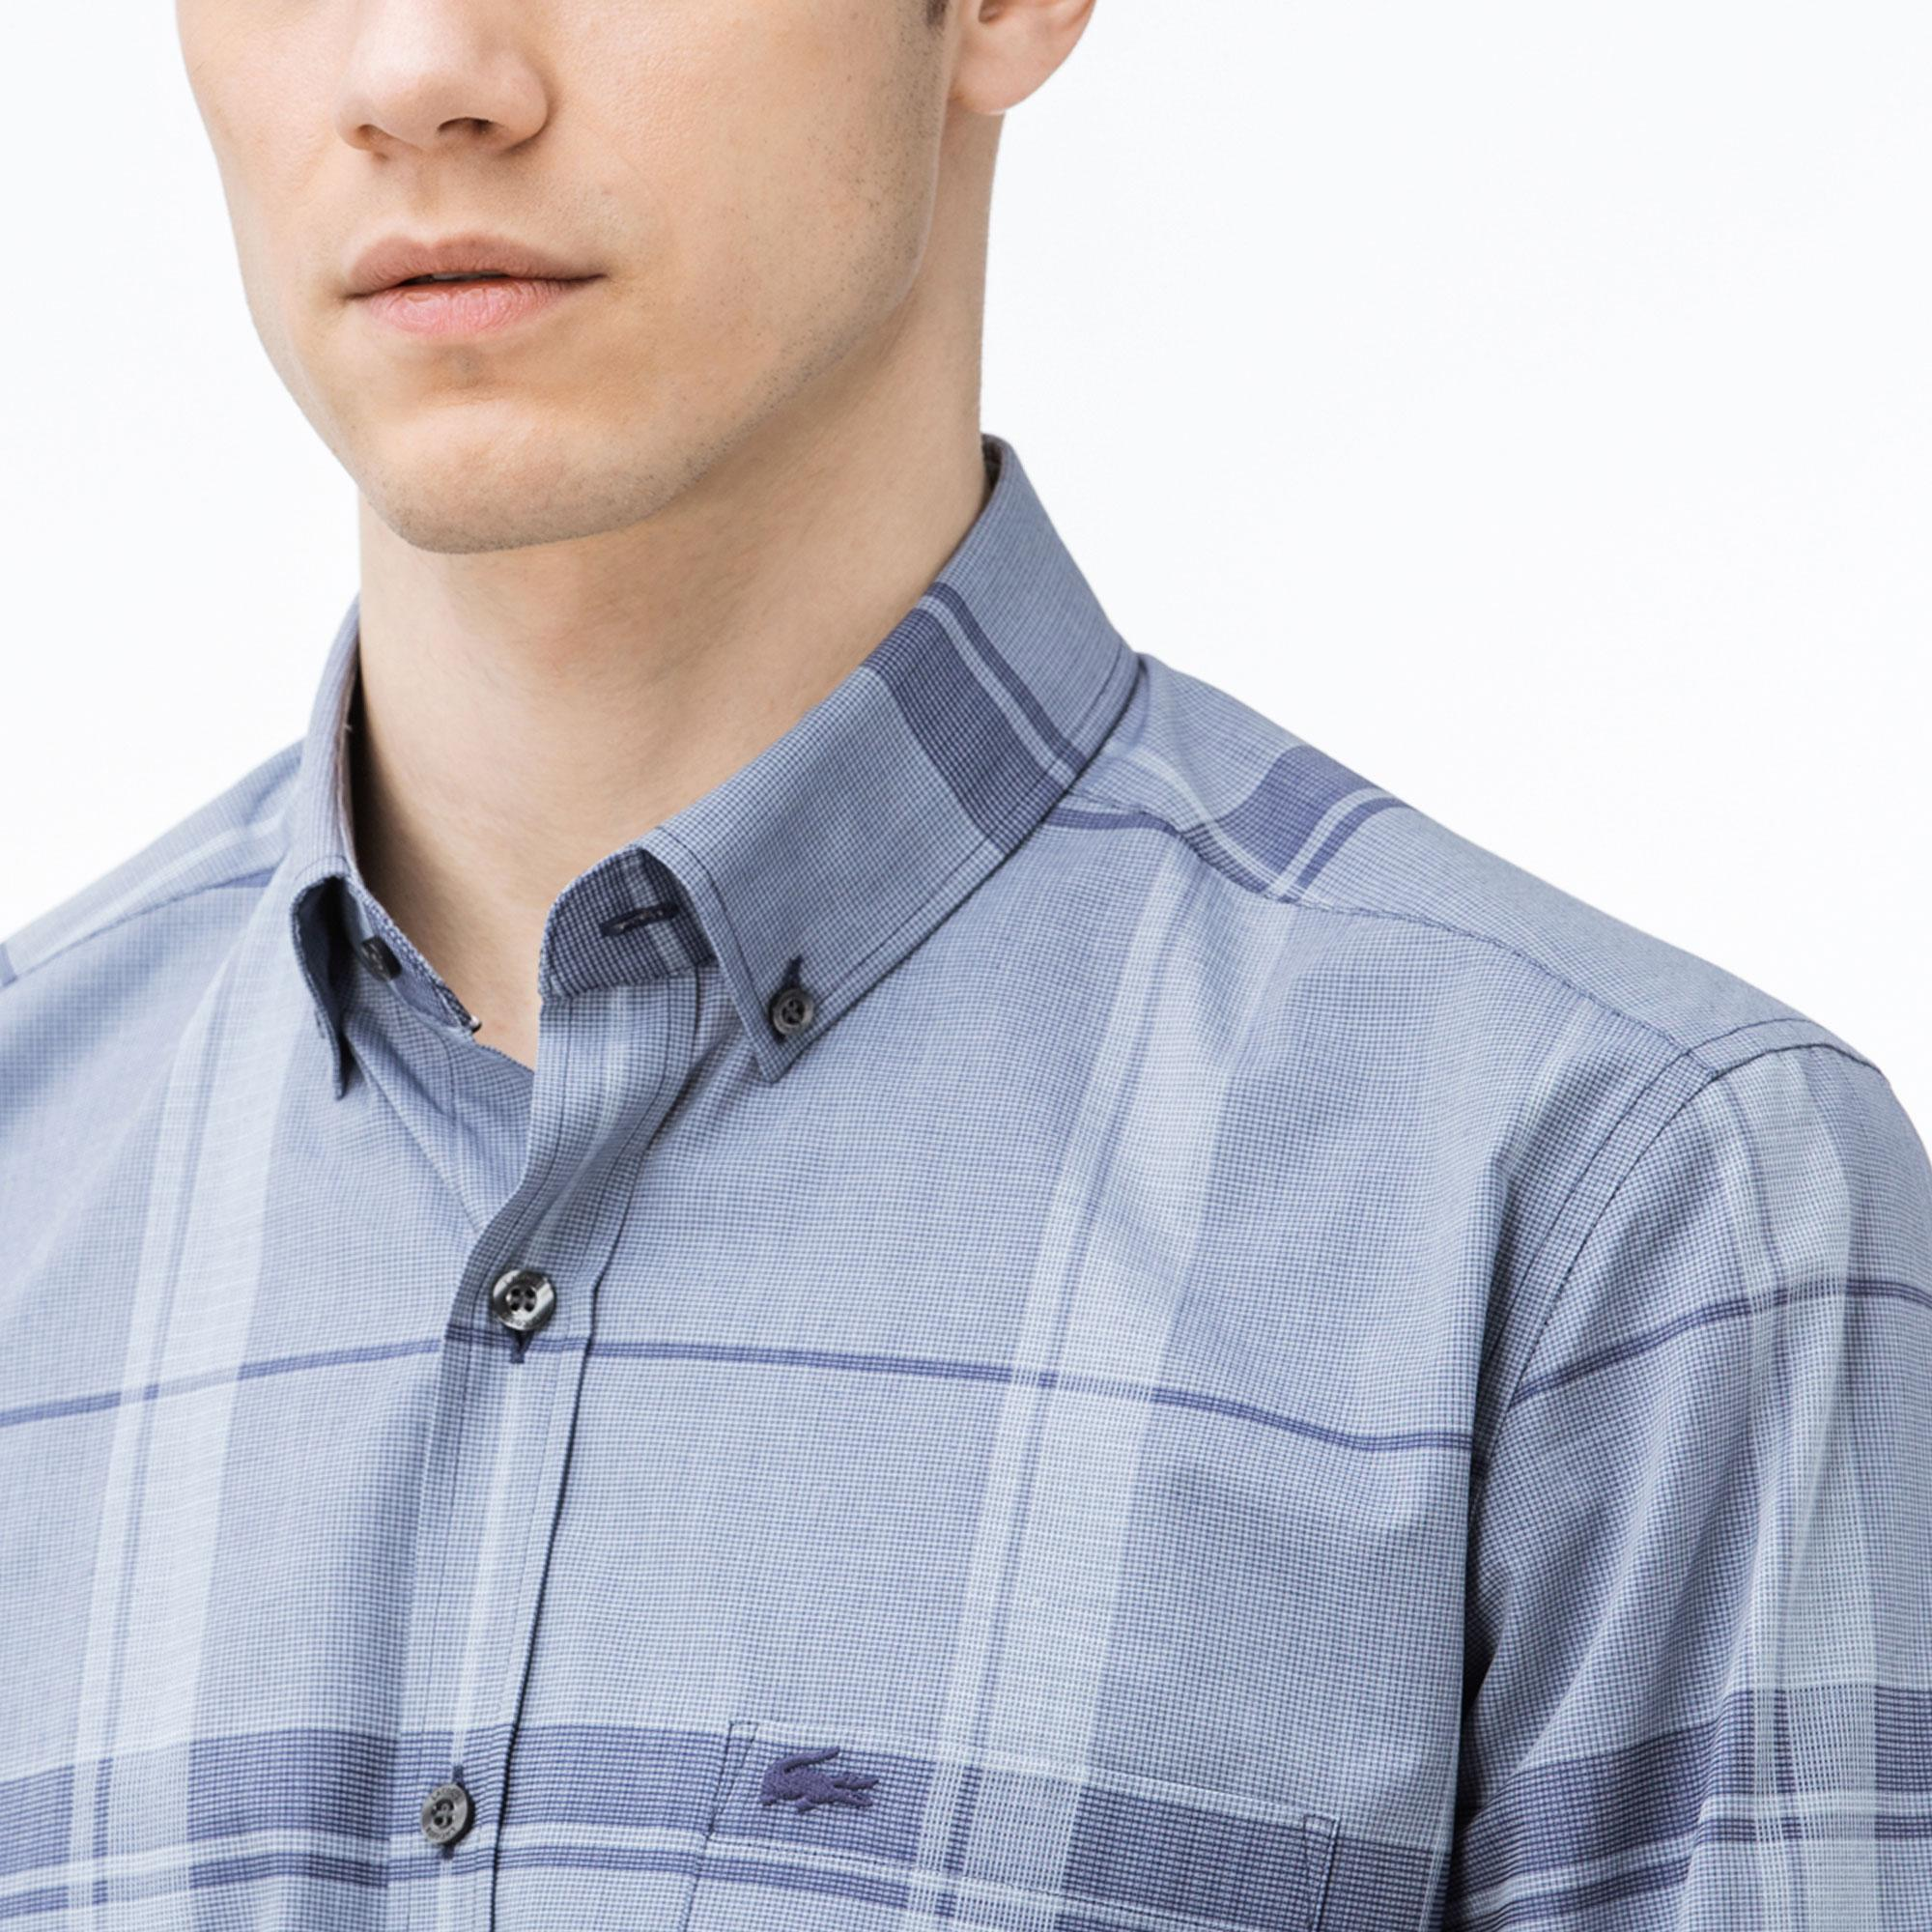 Lacoste Erkek Regular Fit Ekose Lacivert-Gri Gömlek